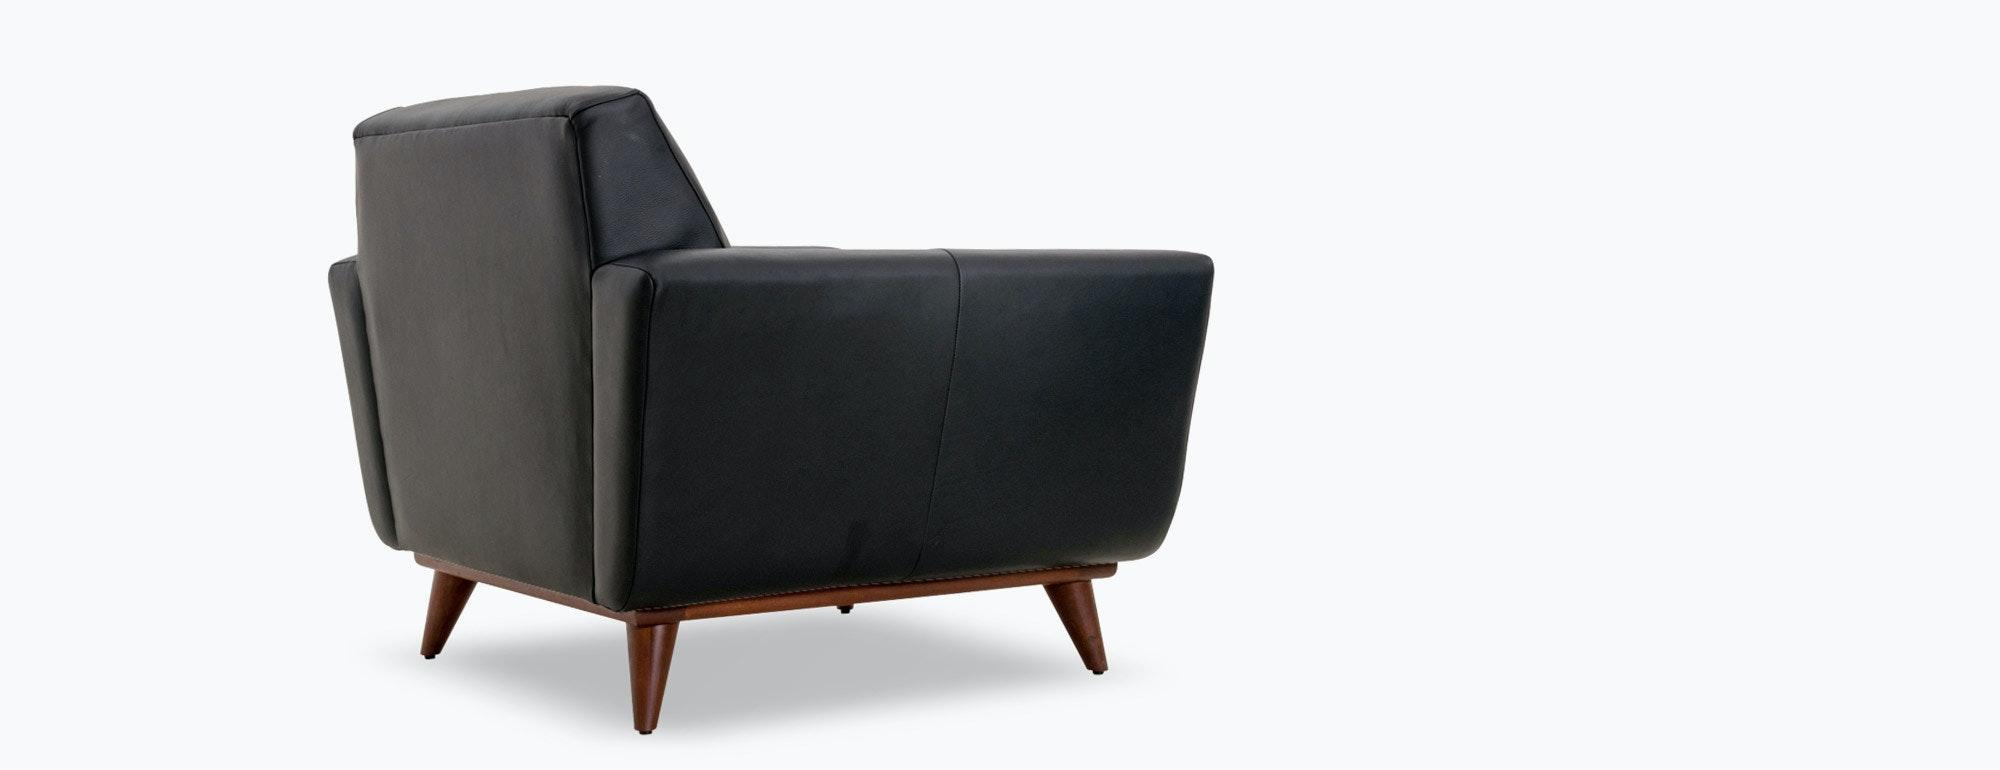 shown in Brighton Black Leather